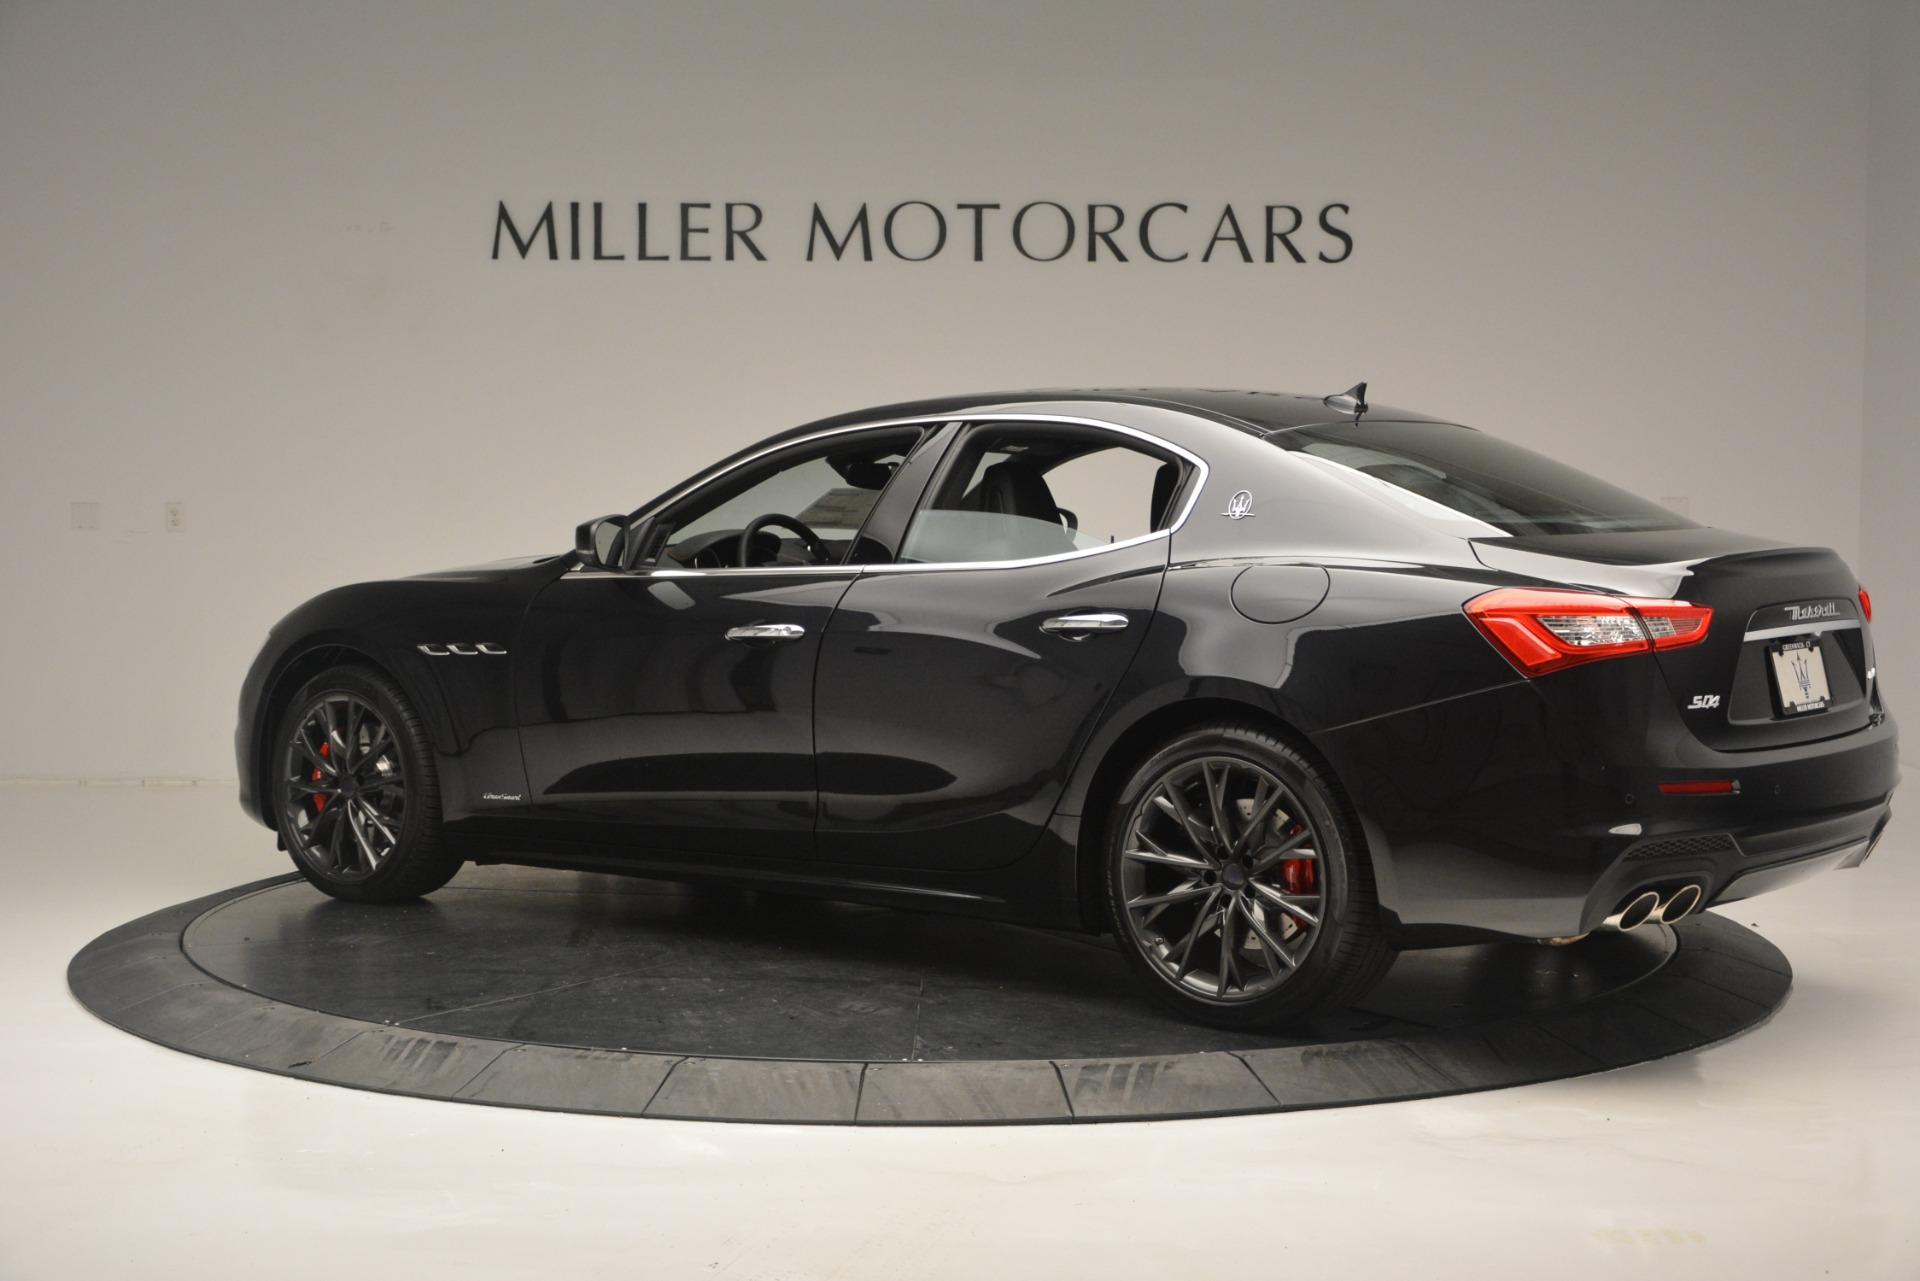 New 2019 Maserati Ghibli S Q4 GranSport For Sale In Westport, CT 2588_p4